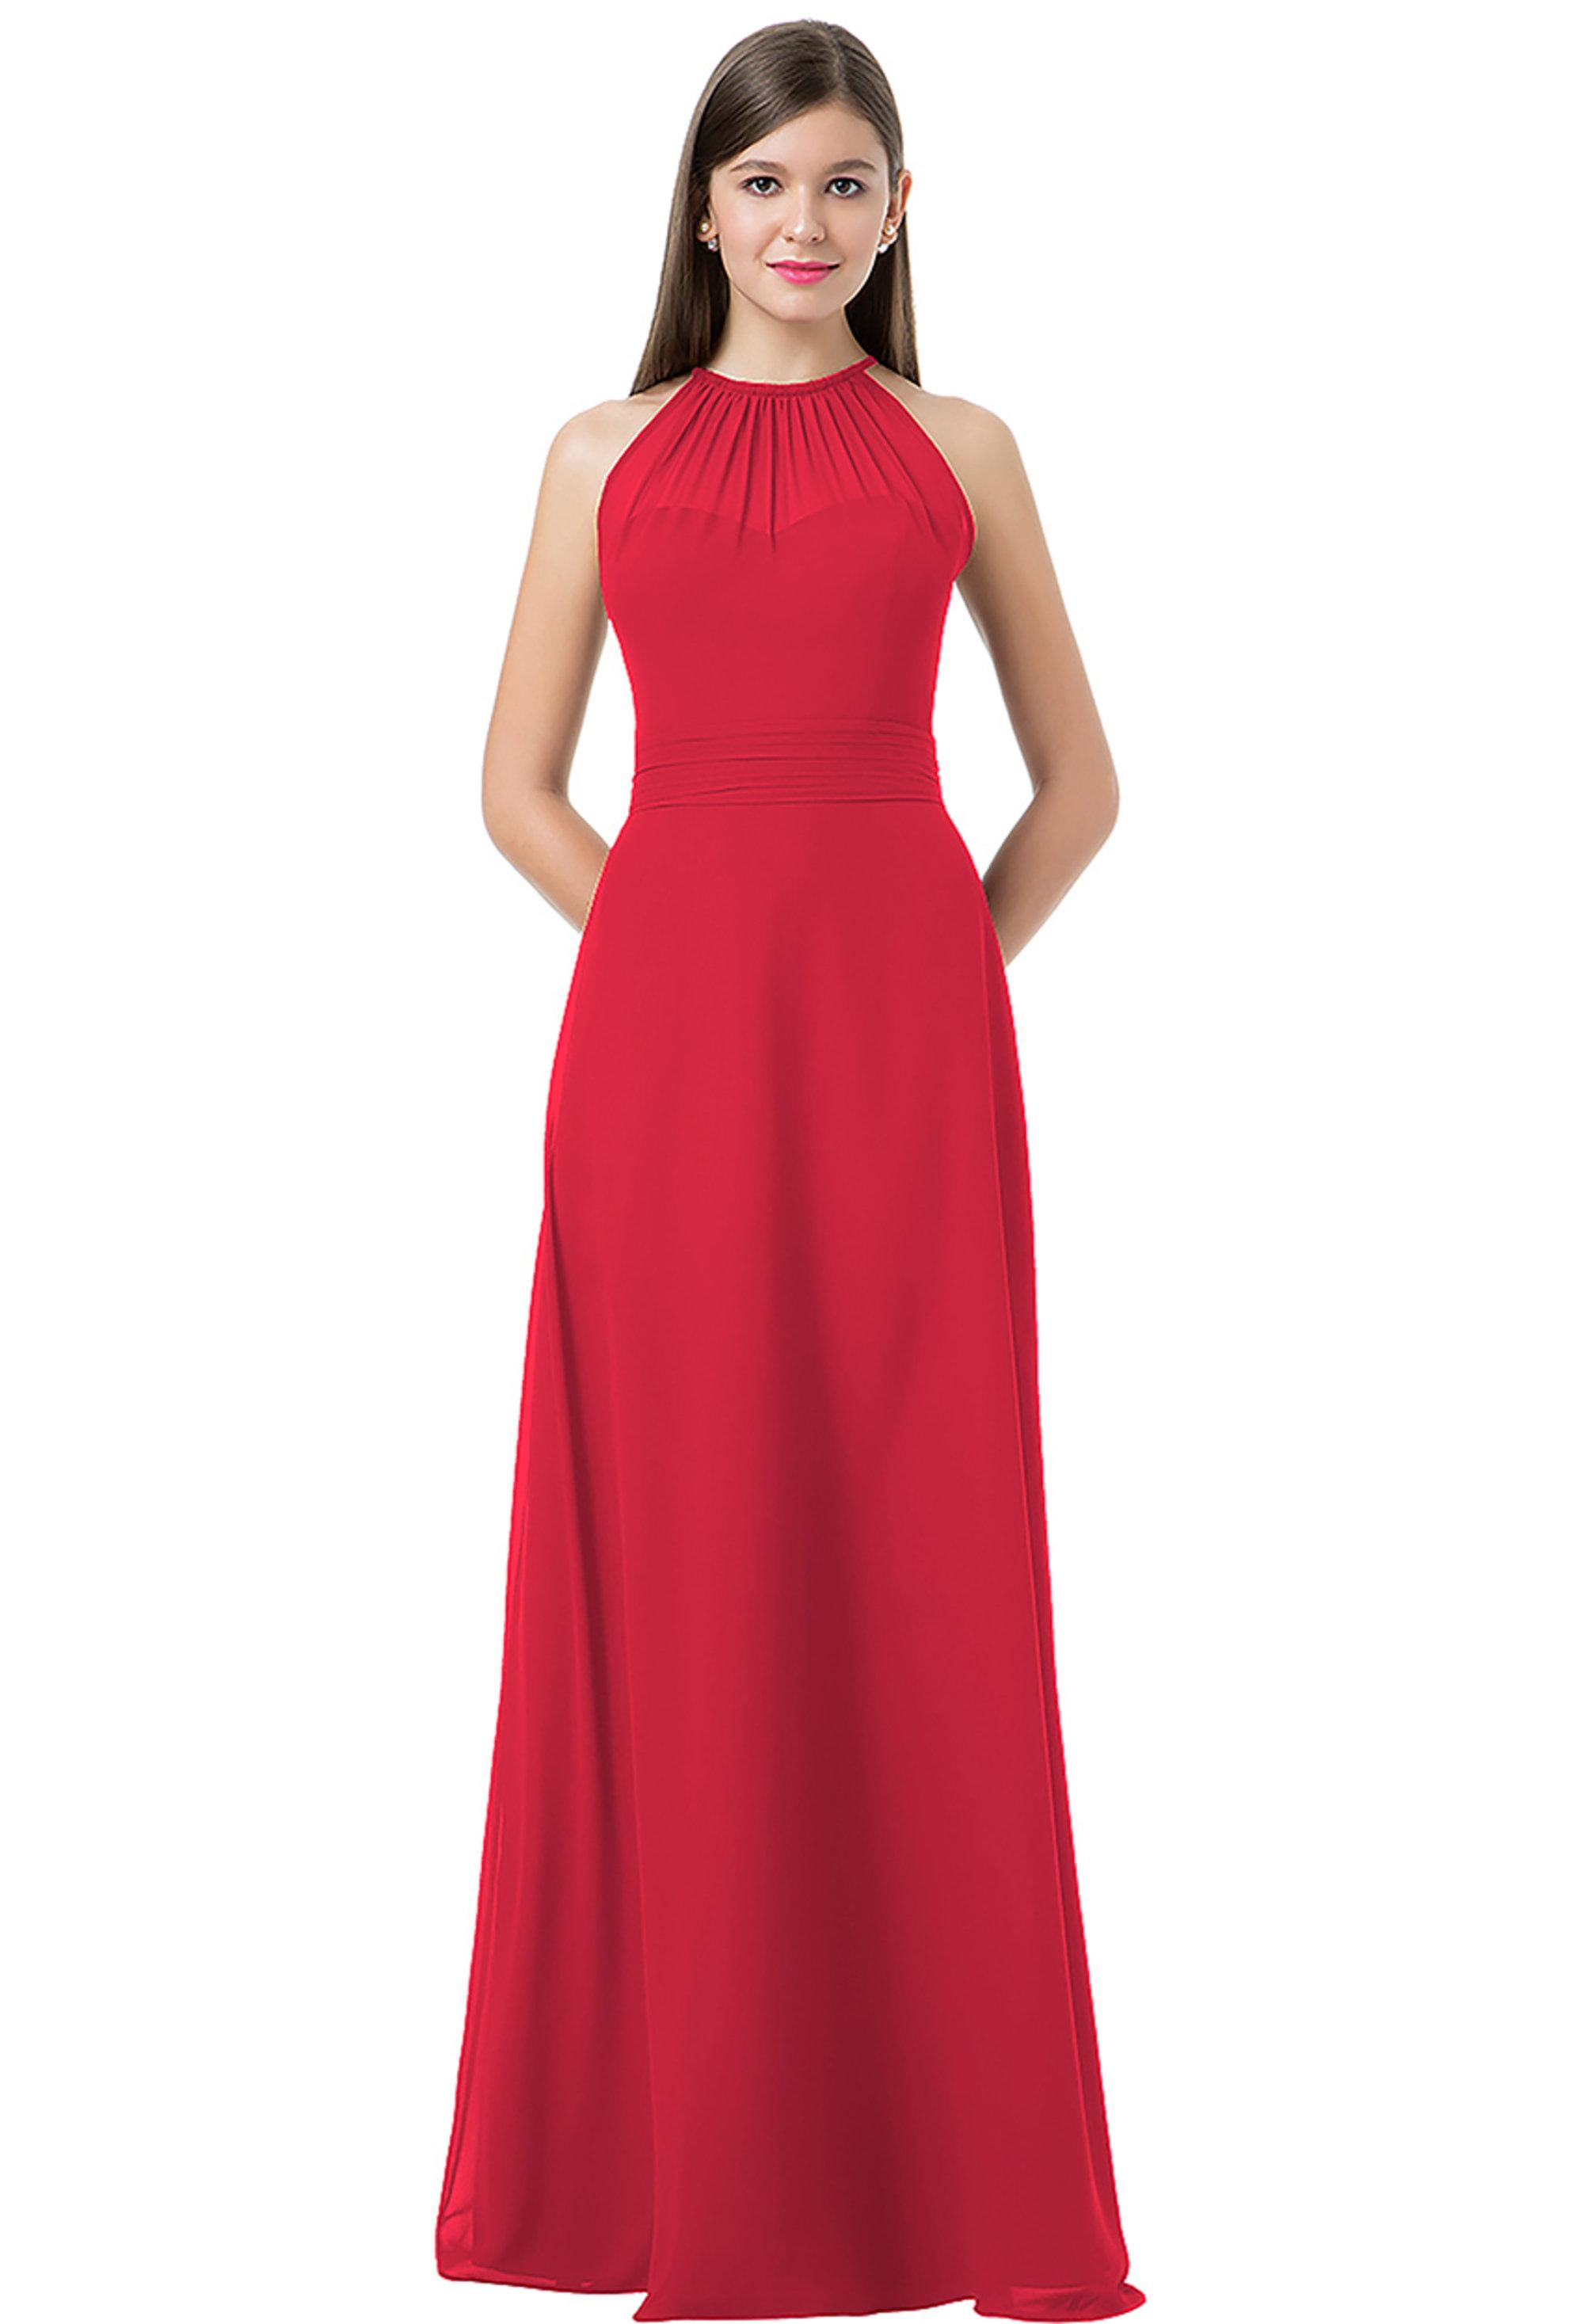 Bill Levkoff CHERRY Chiffon Spaghetti Tie A-line gown, $220.00 Front